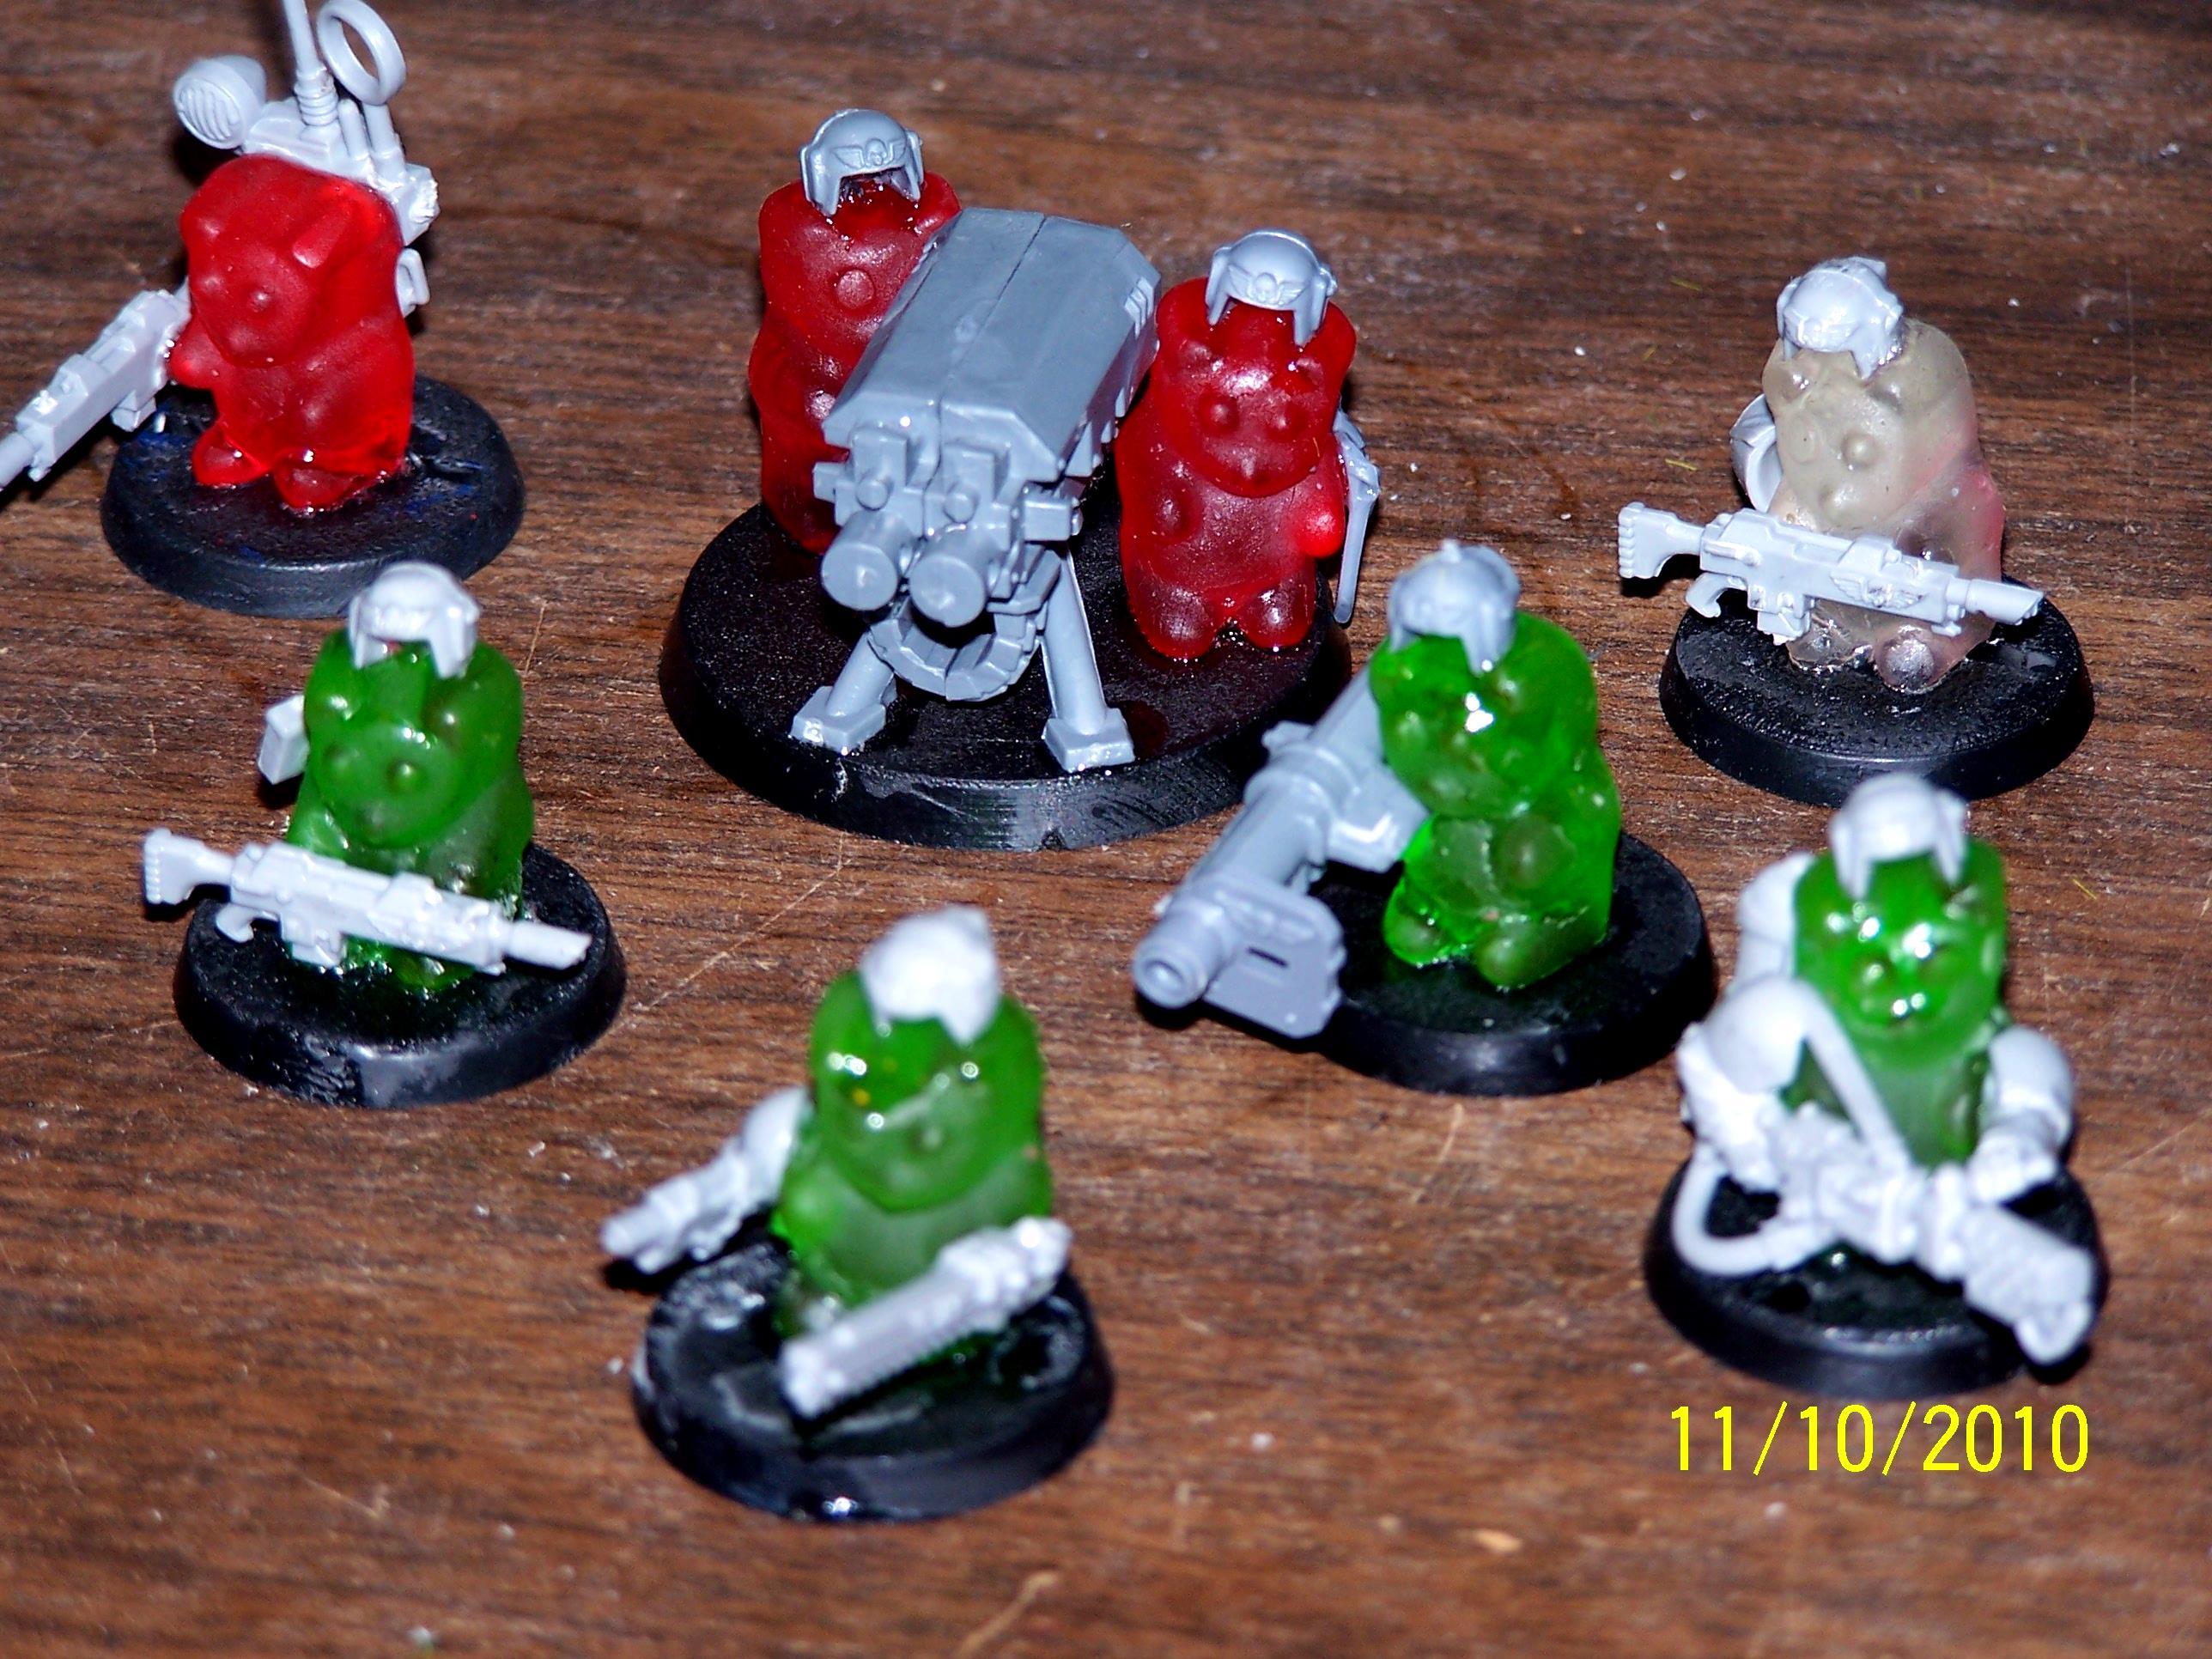 Gummy Bear, Humor, Imperial Guard, Warhammer 40,000, Work In Progress